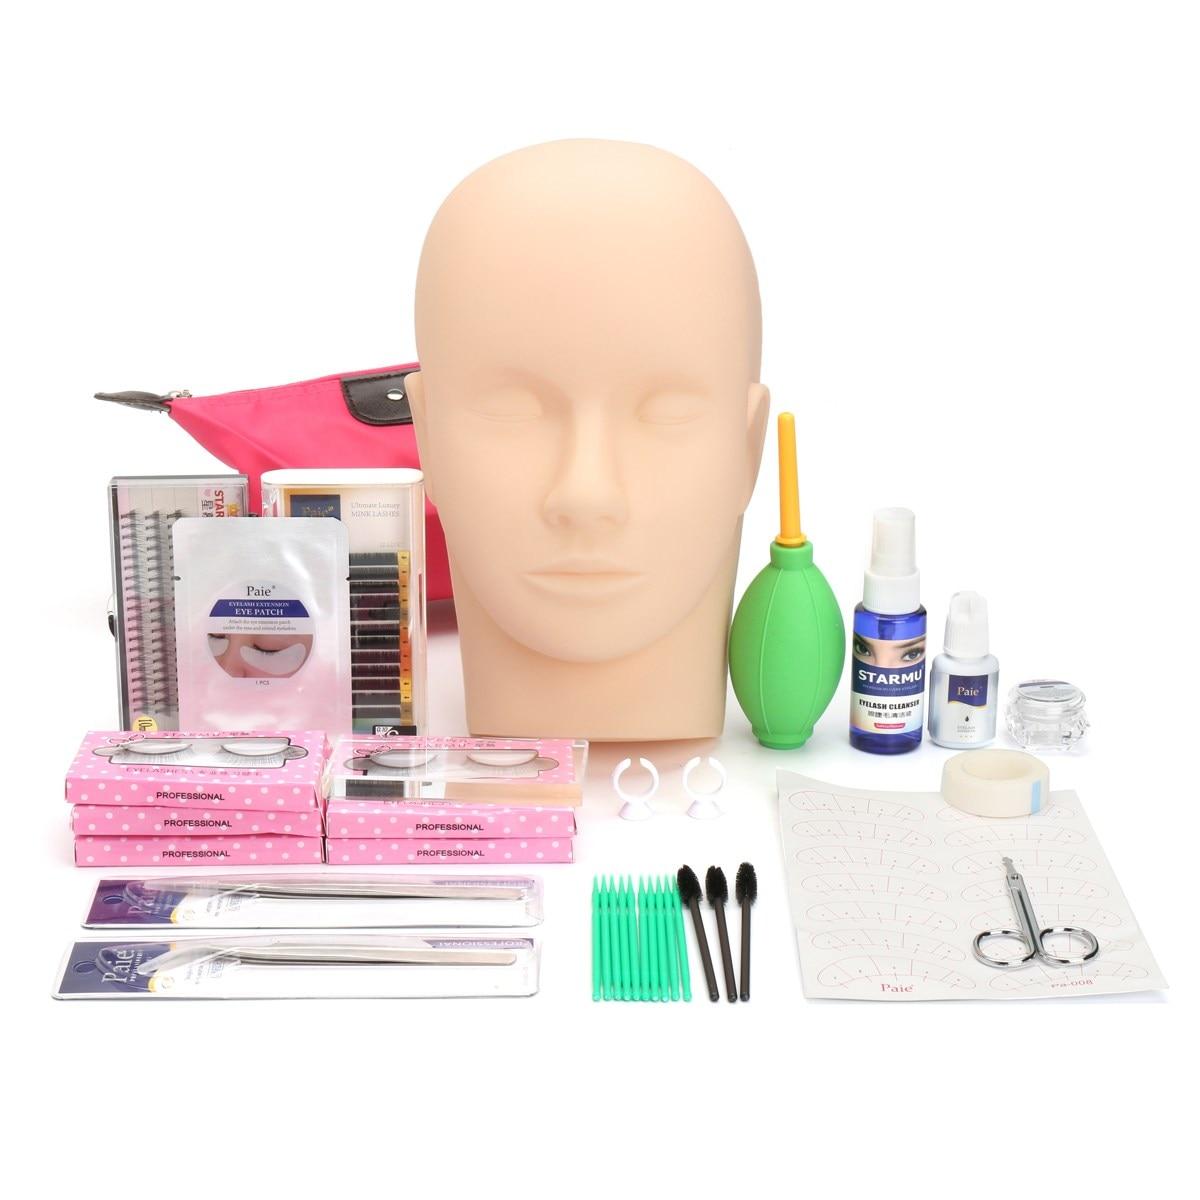 36 Stks Mannequin Training Hoofd Wimper Extension Praktijk Make Up Tool Kit Met Case Geselecteerd Materiaal